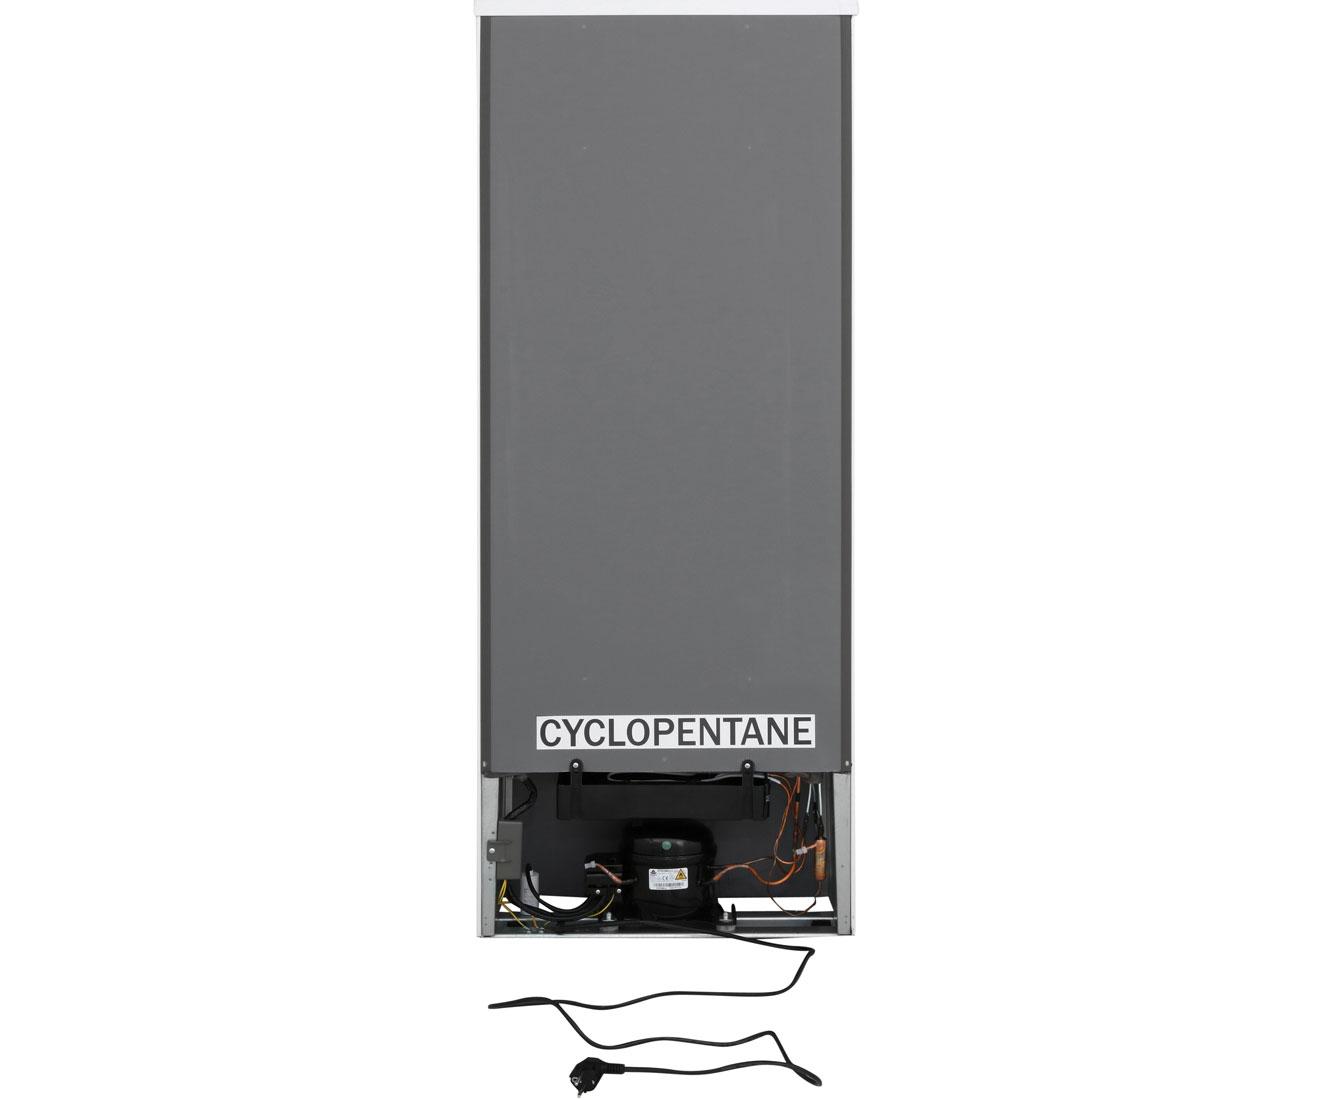 Bomann Kühlschrank Freistehend : Kühlschrank edelstahl freistehend siemens kg39eal43 iq500 kühl